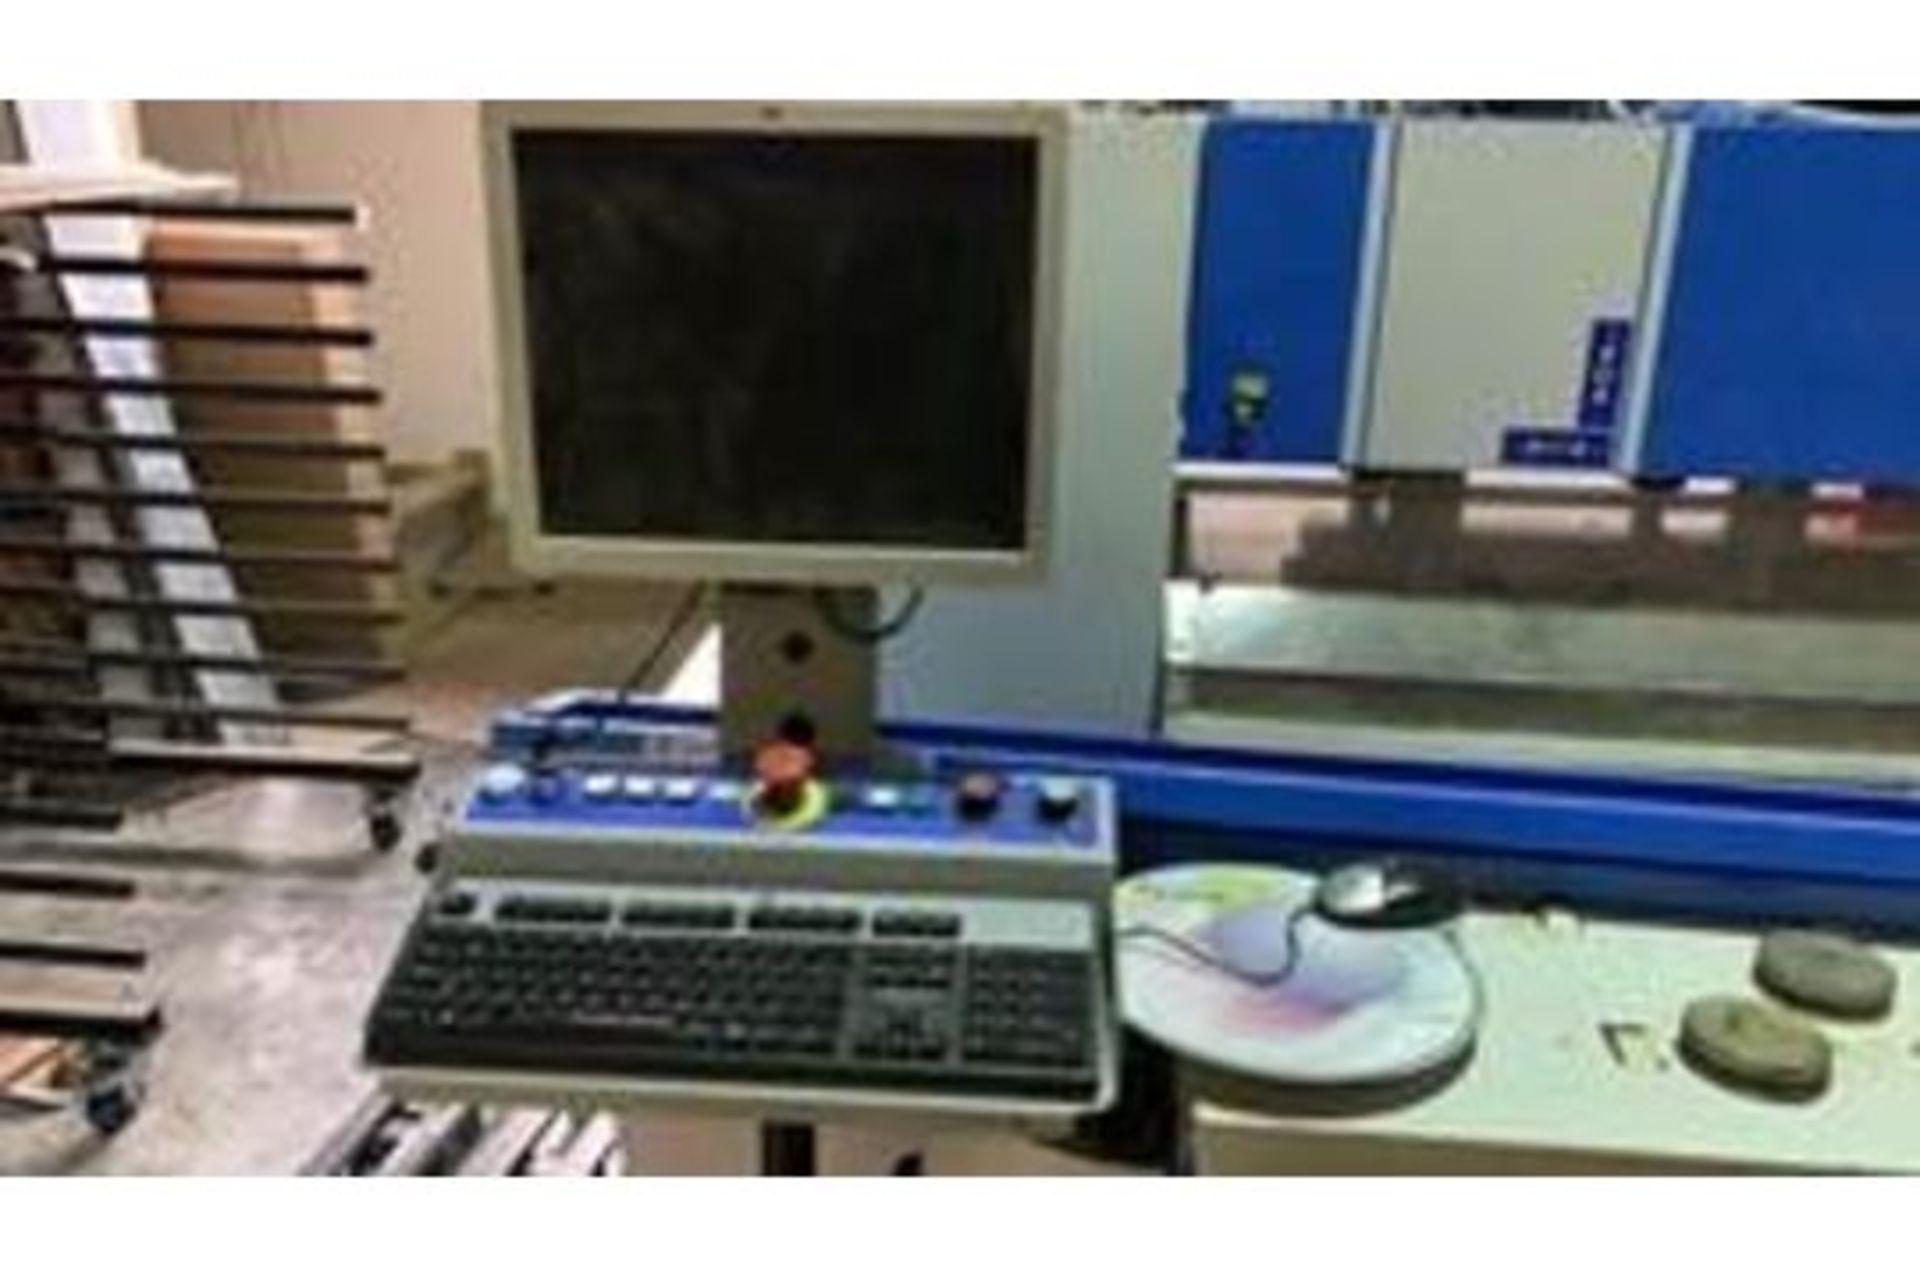 2010 Masterwood Project TF100 CNC Machine Centre - Image 2 of 7